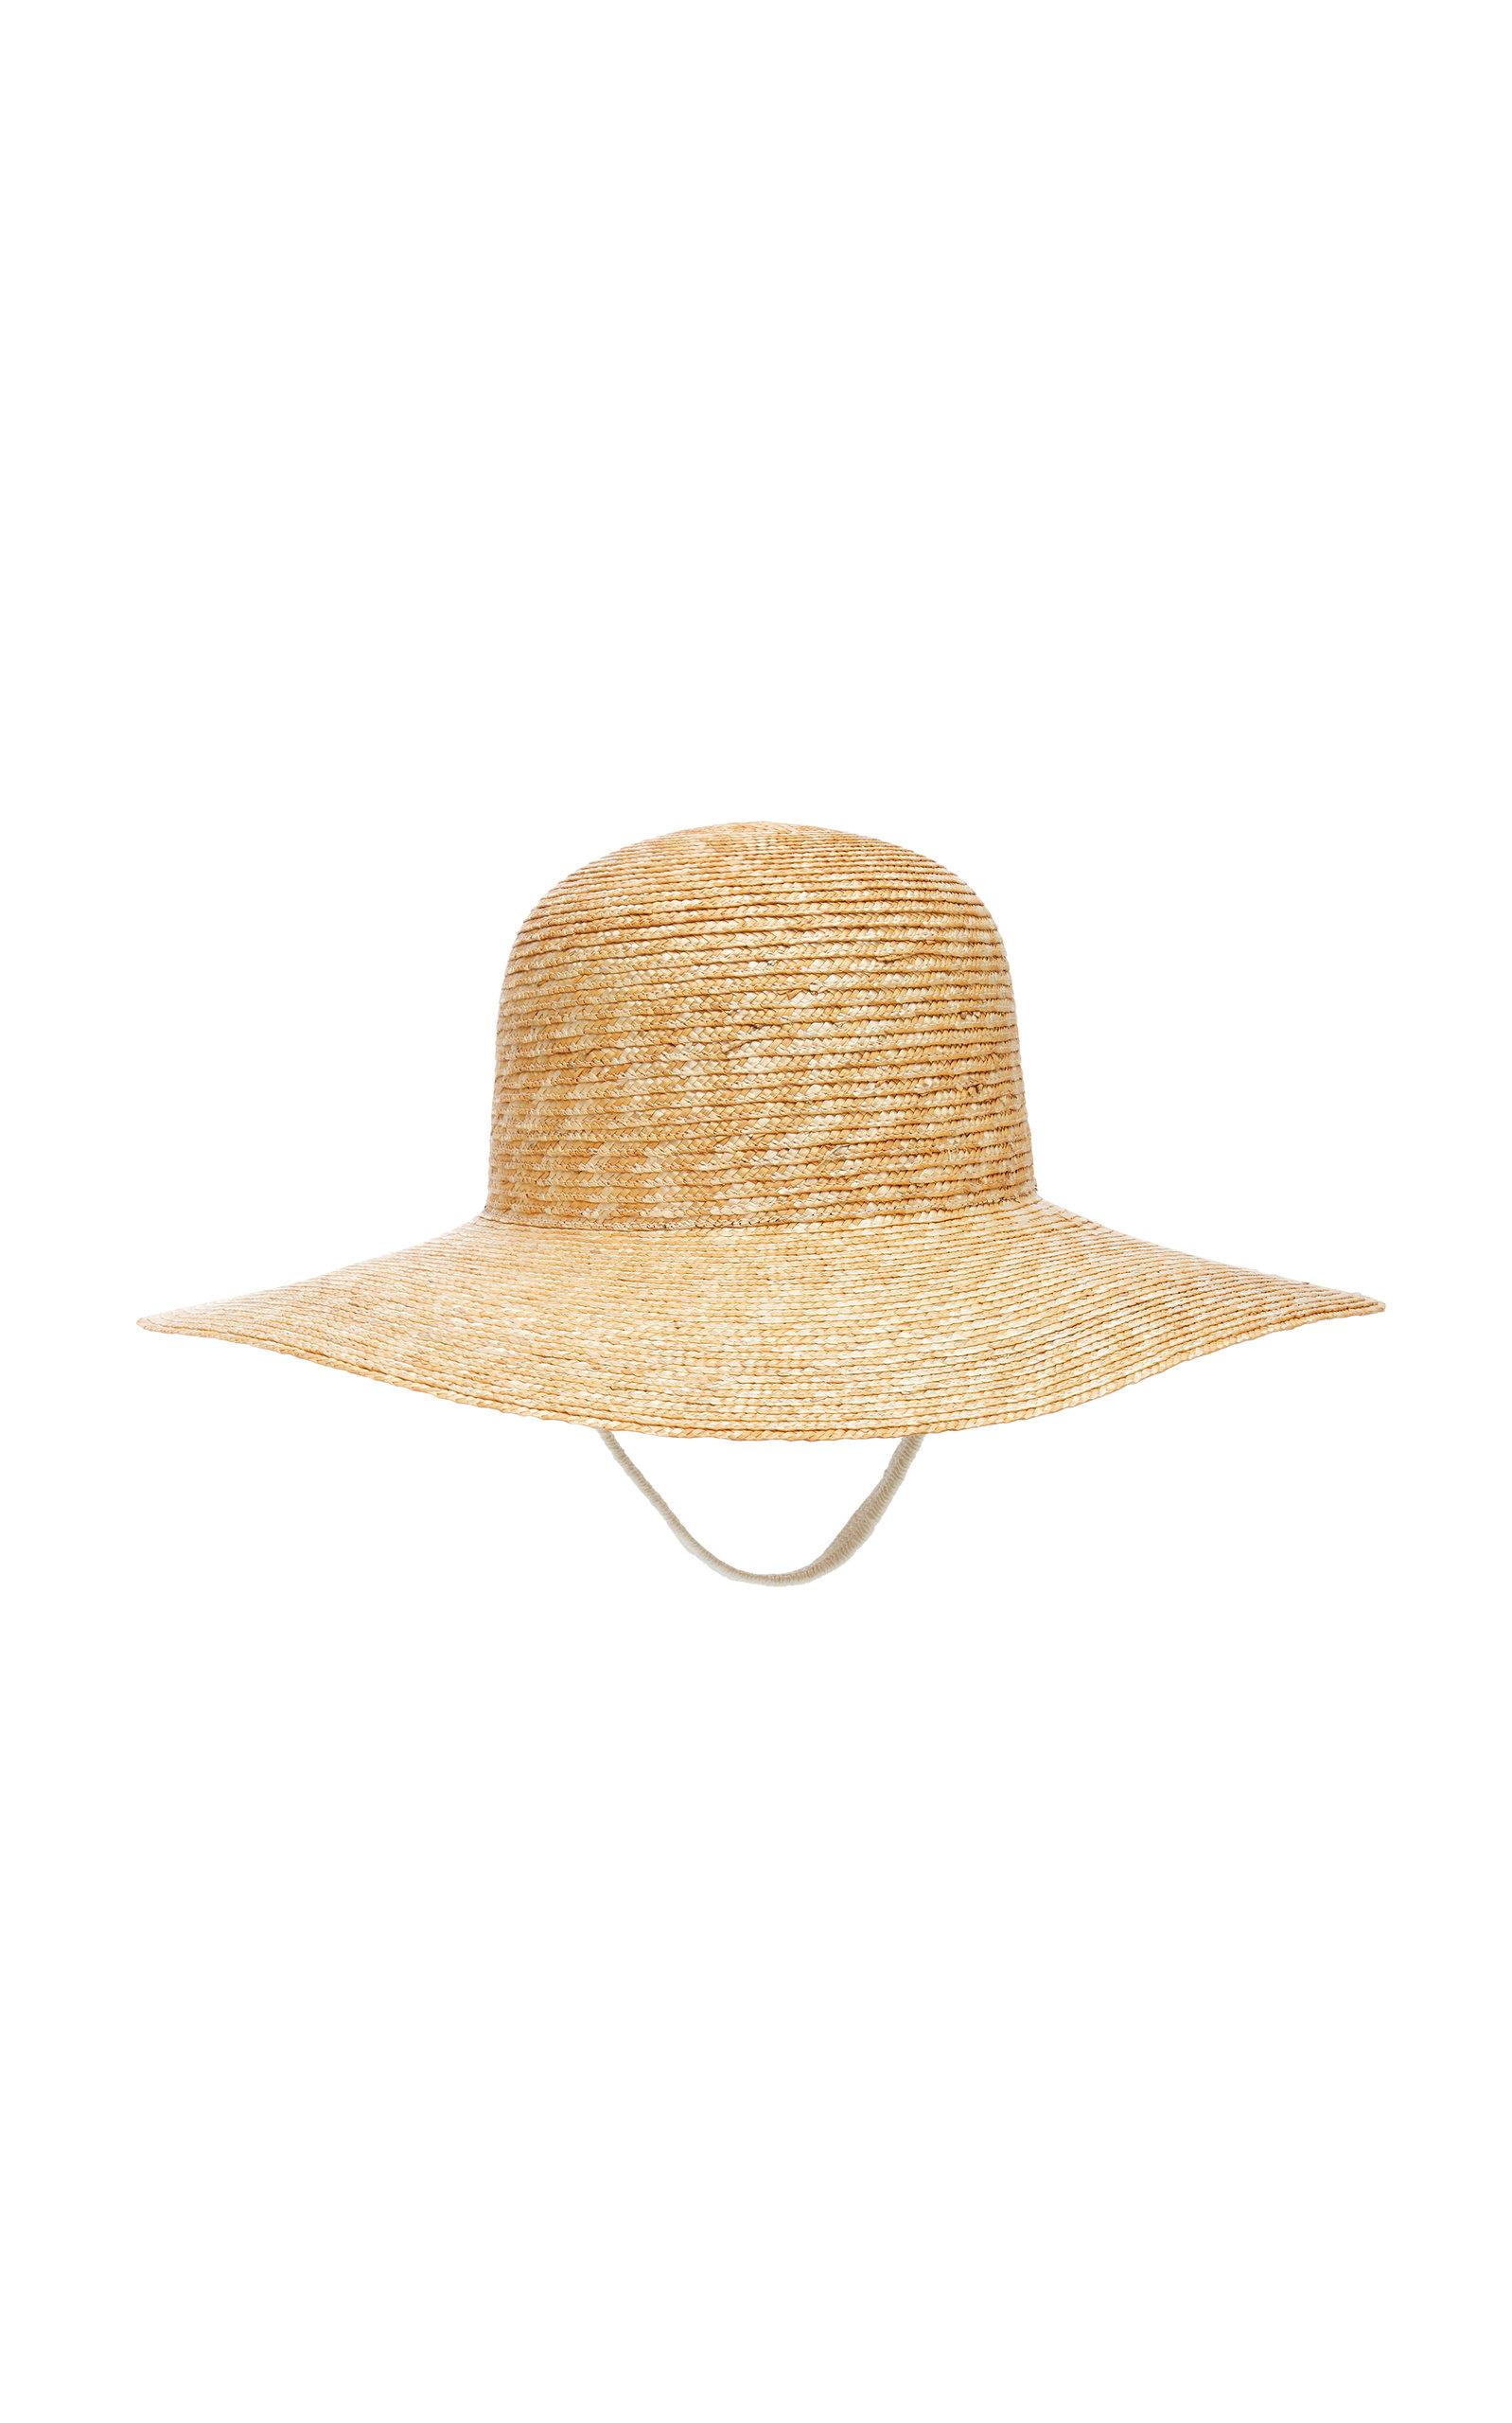 79b9c8aa298 Woven Wide-Brimmed Sun Hat by Federica Moretti